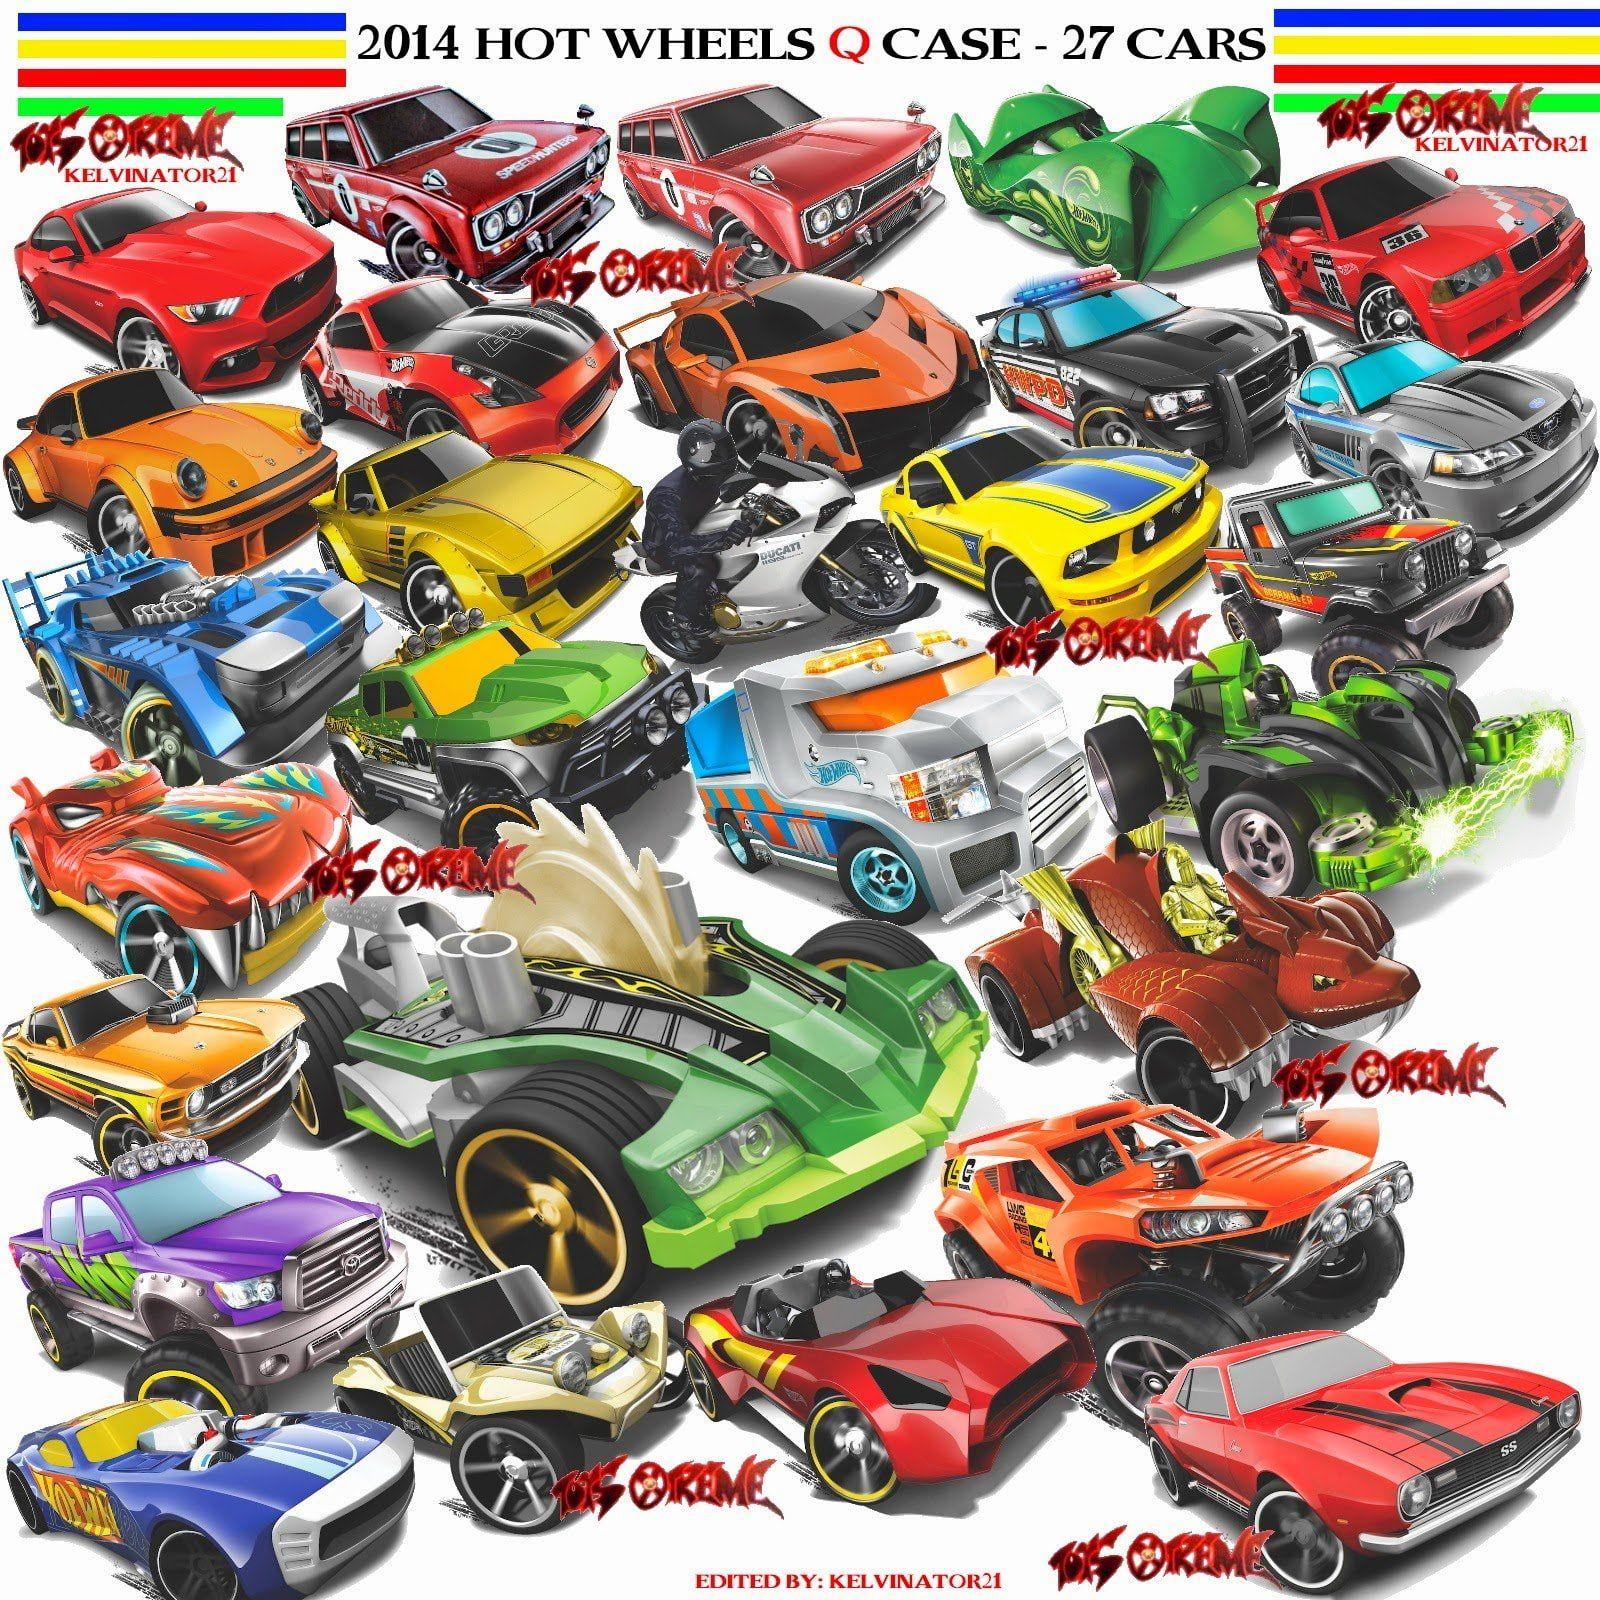 Hotwheels Large Hot Wheels Toys Hot Wheels Hot Wheels Garage